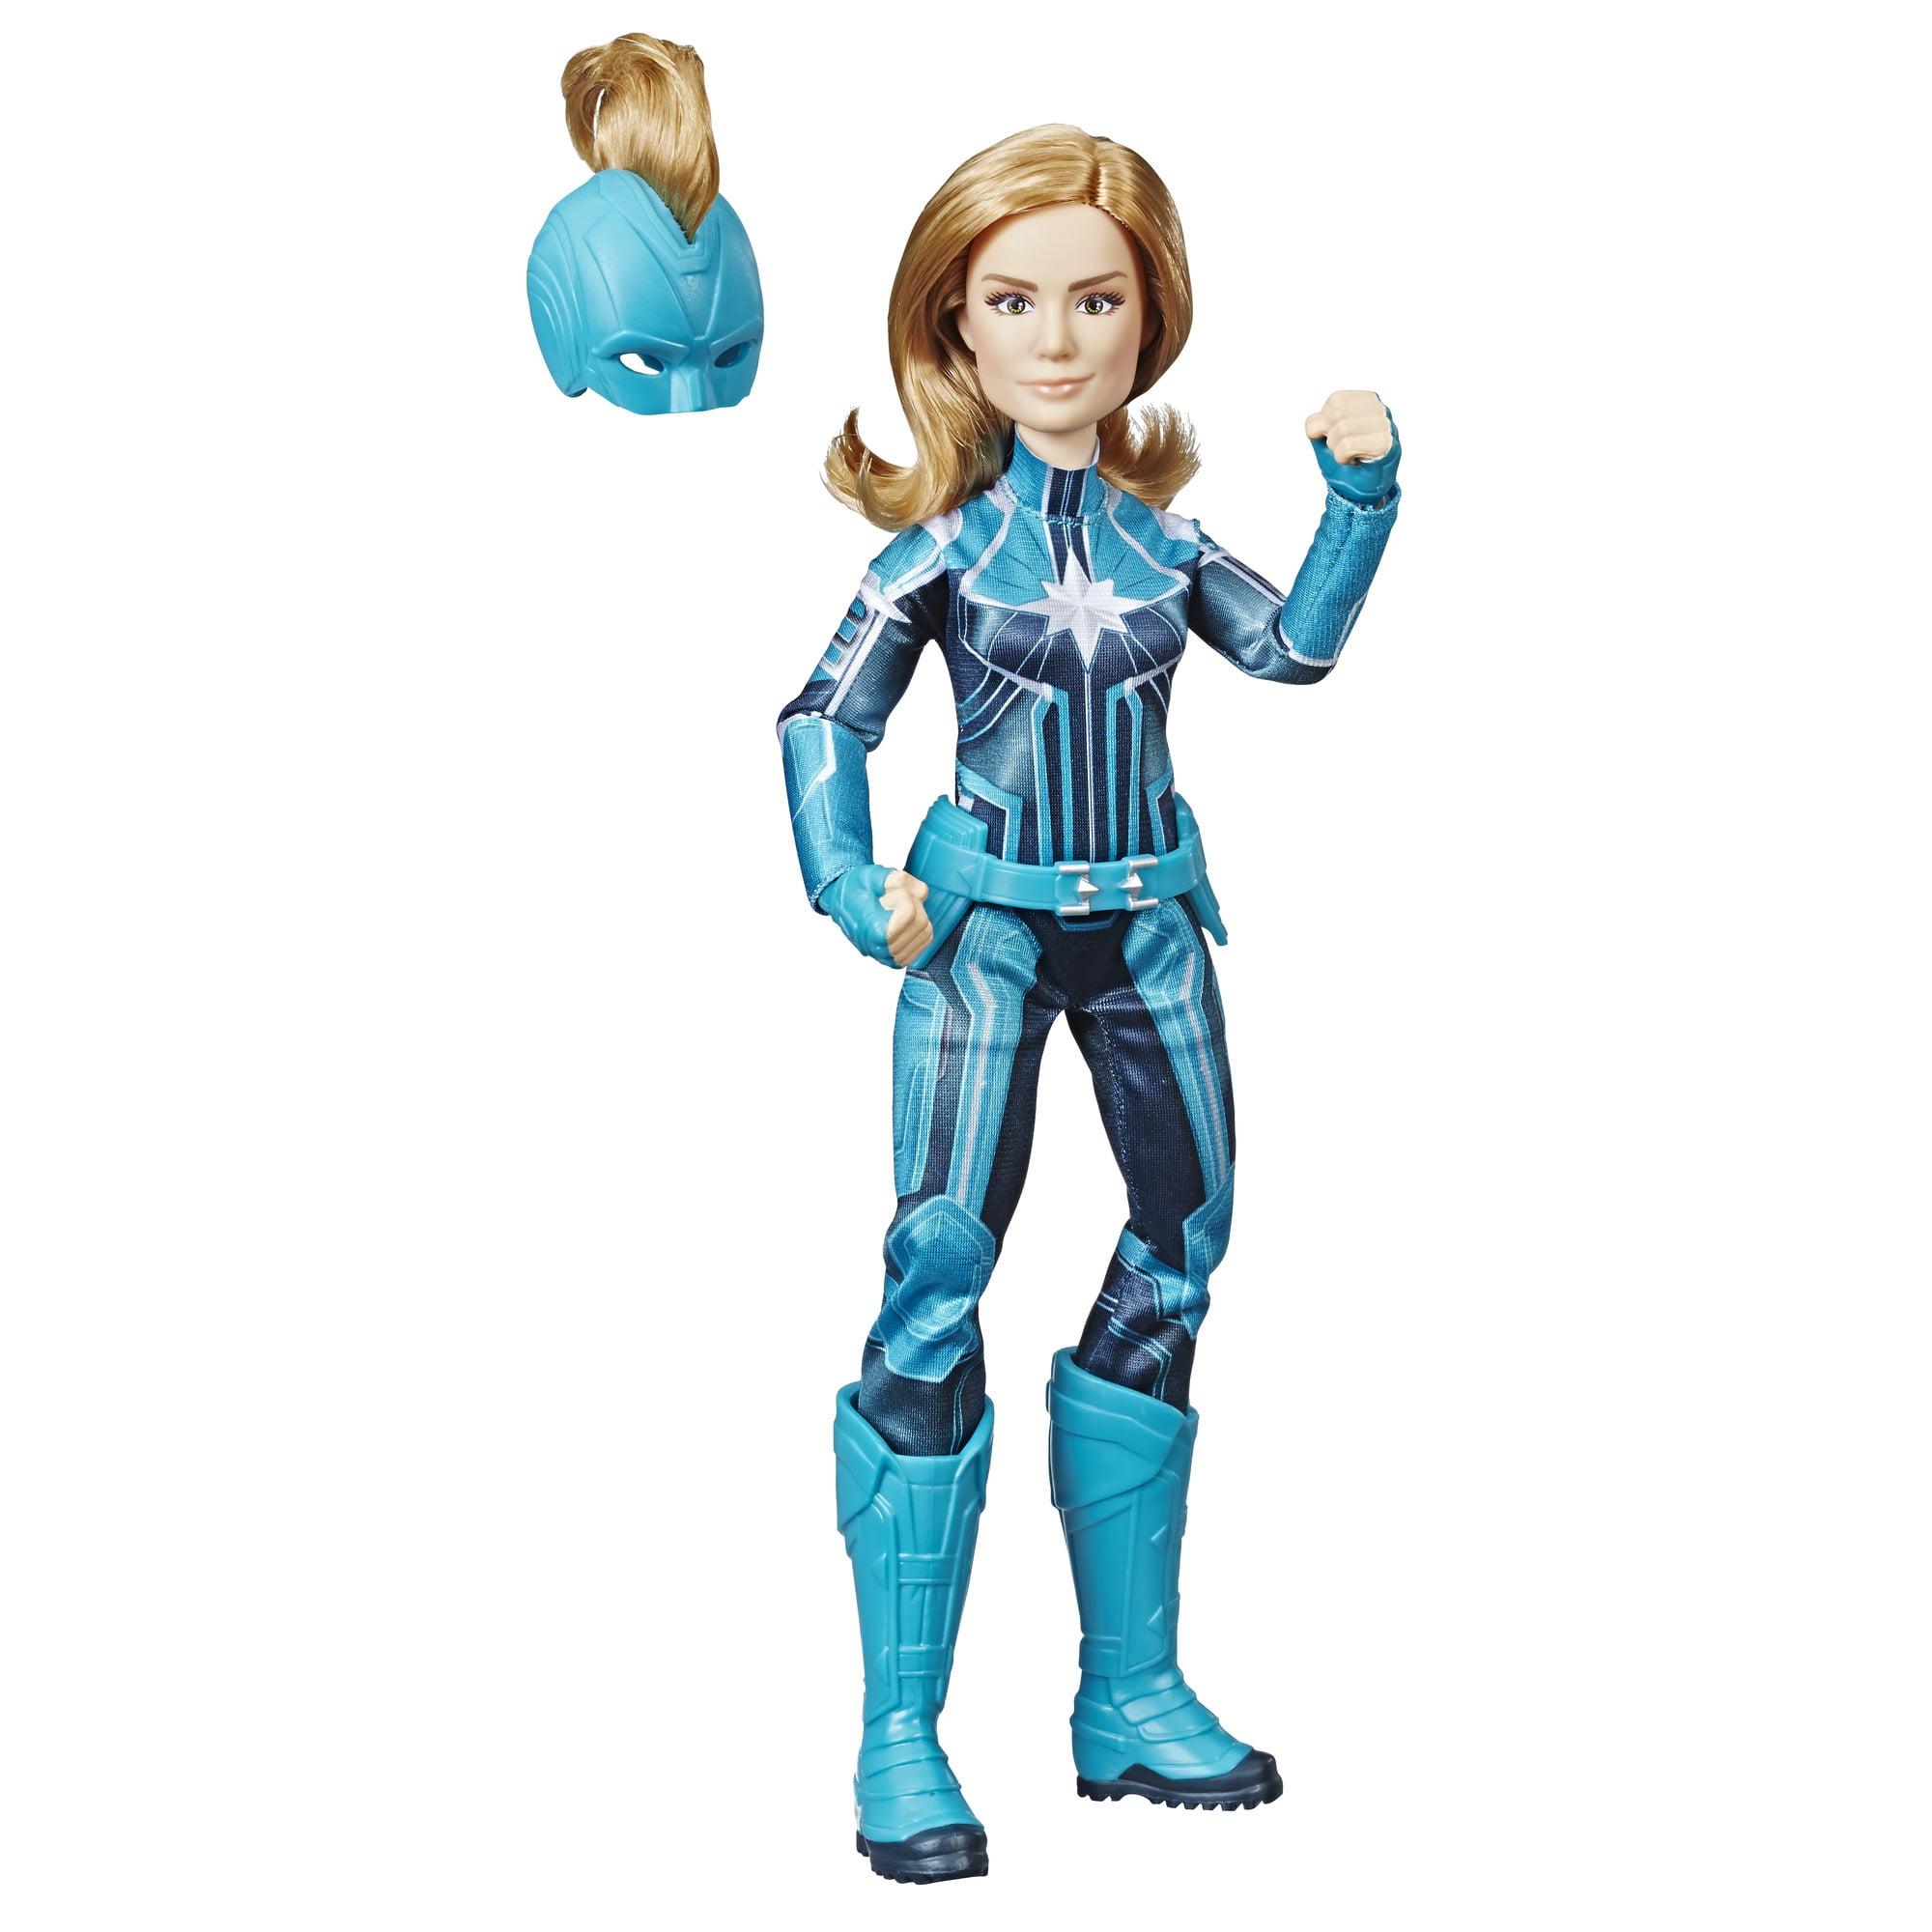 Marvel Captain Marvel Starforce Super Hero Doll with Helmet Accessory